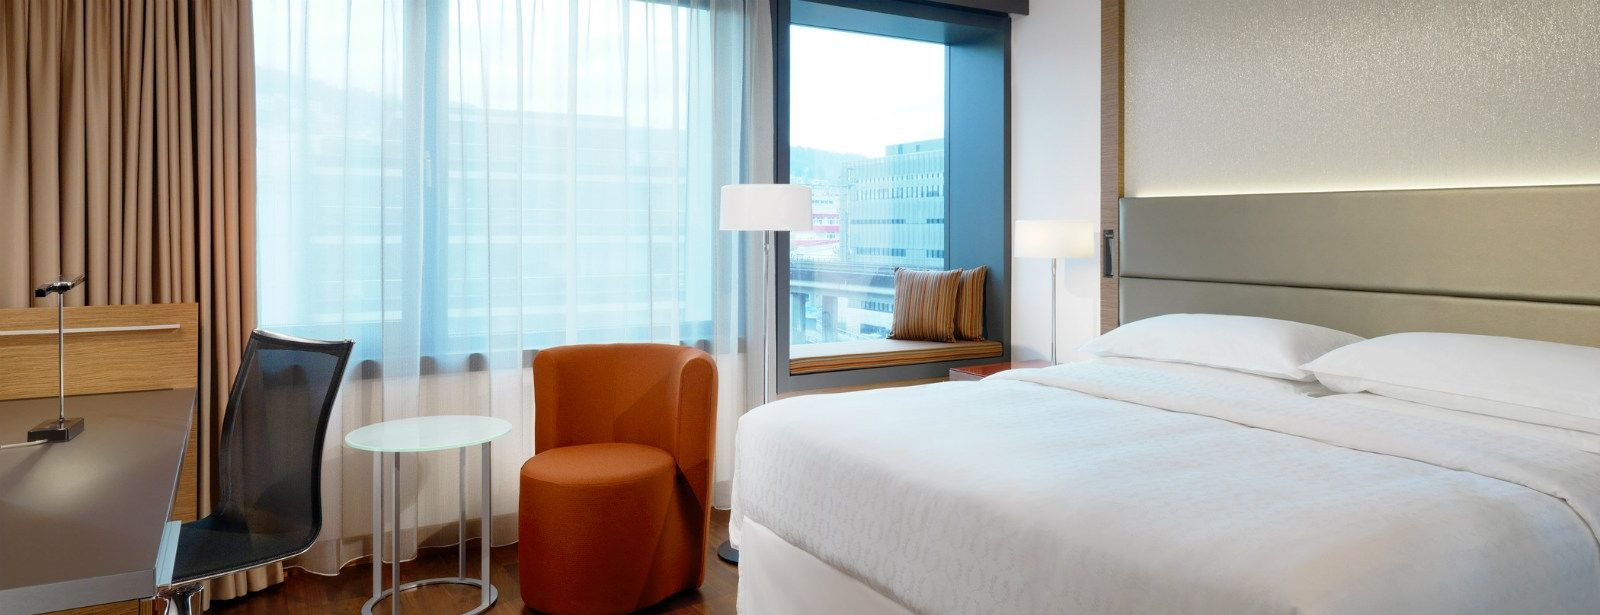 3732-Sheraton-Zurich-Hotel-Sheraton-Room-1600x900